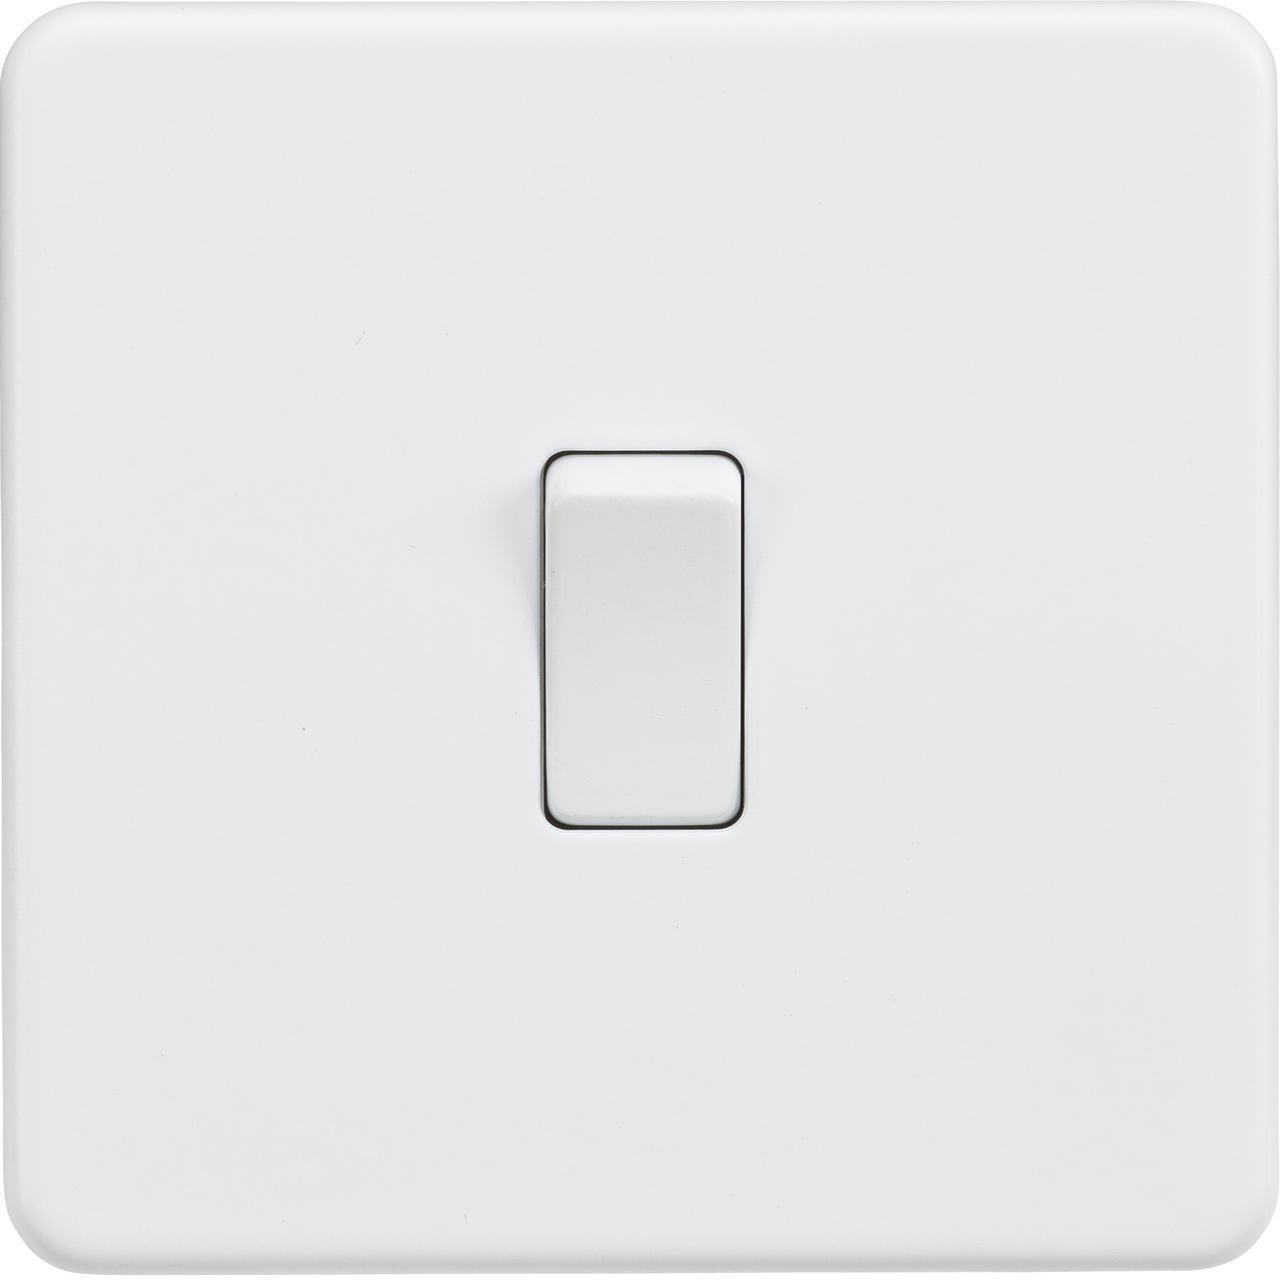 Screwless 10A 1G 2-Way Switch - Matt White (DFL1SF2000MW)